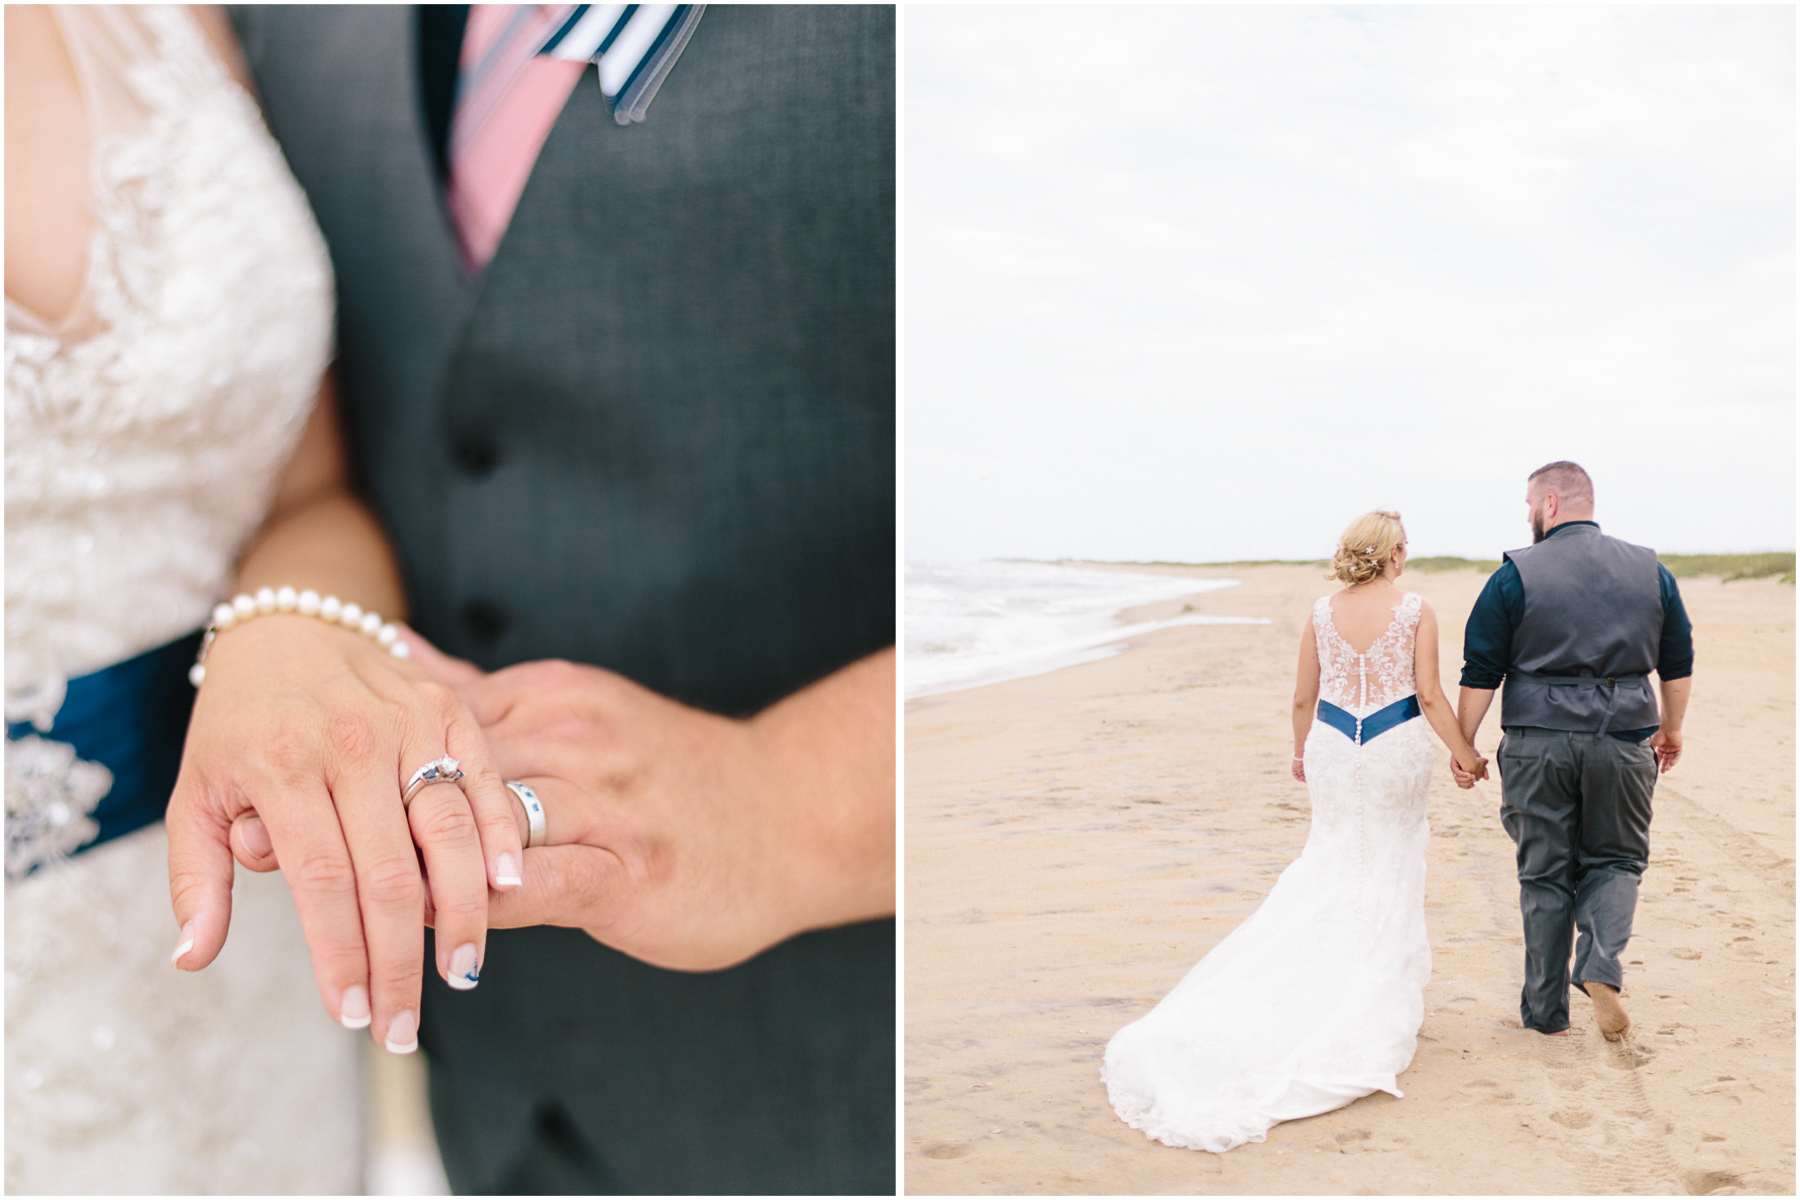 alyssa barletter photography buxton north carolina outer banks obx cape hatteras elopement intmate beach wedding-38.jpg